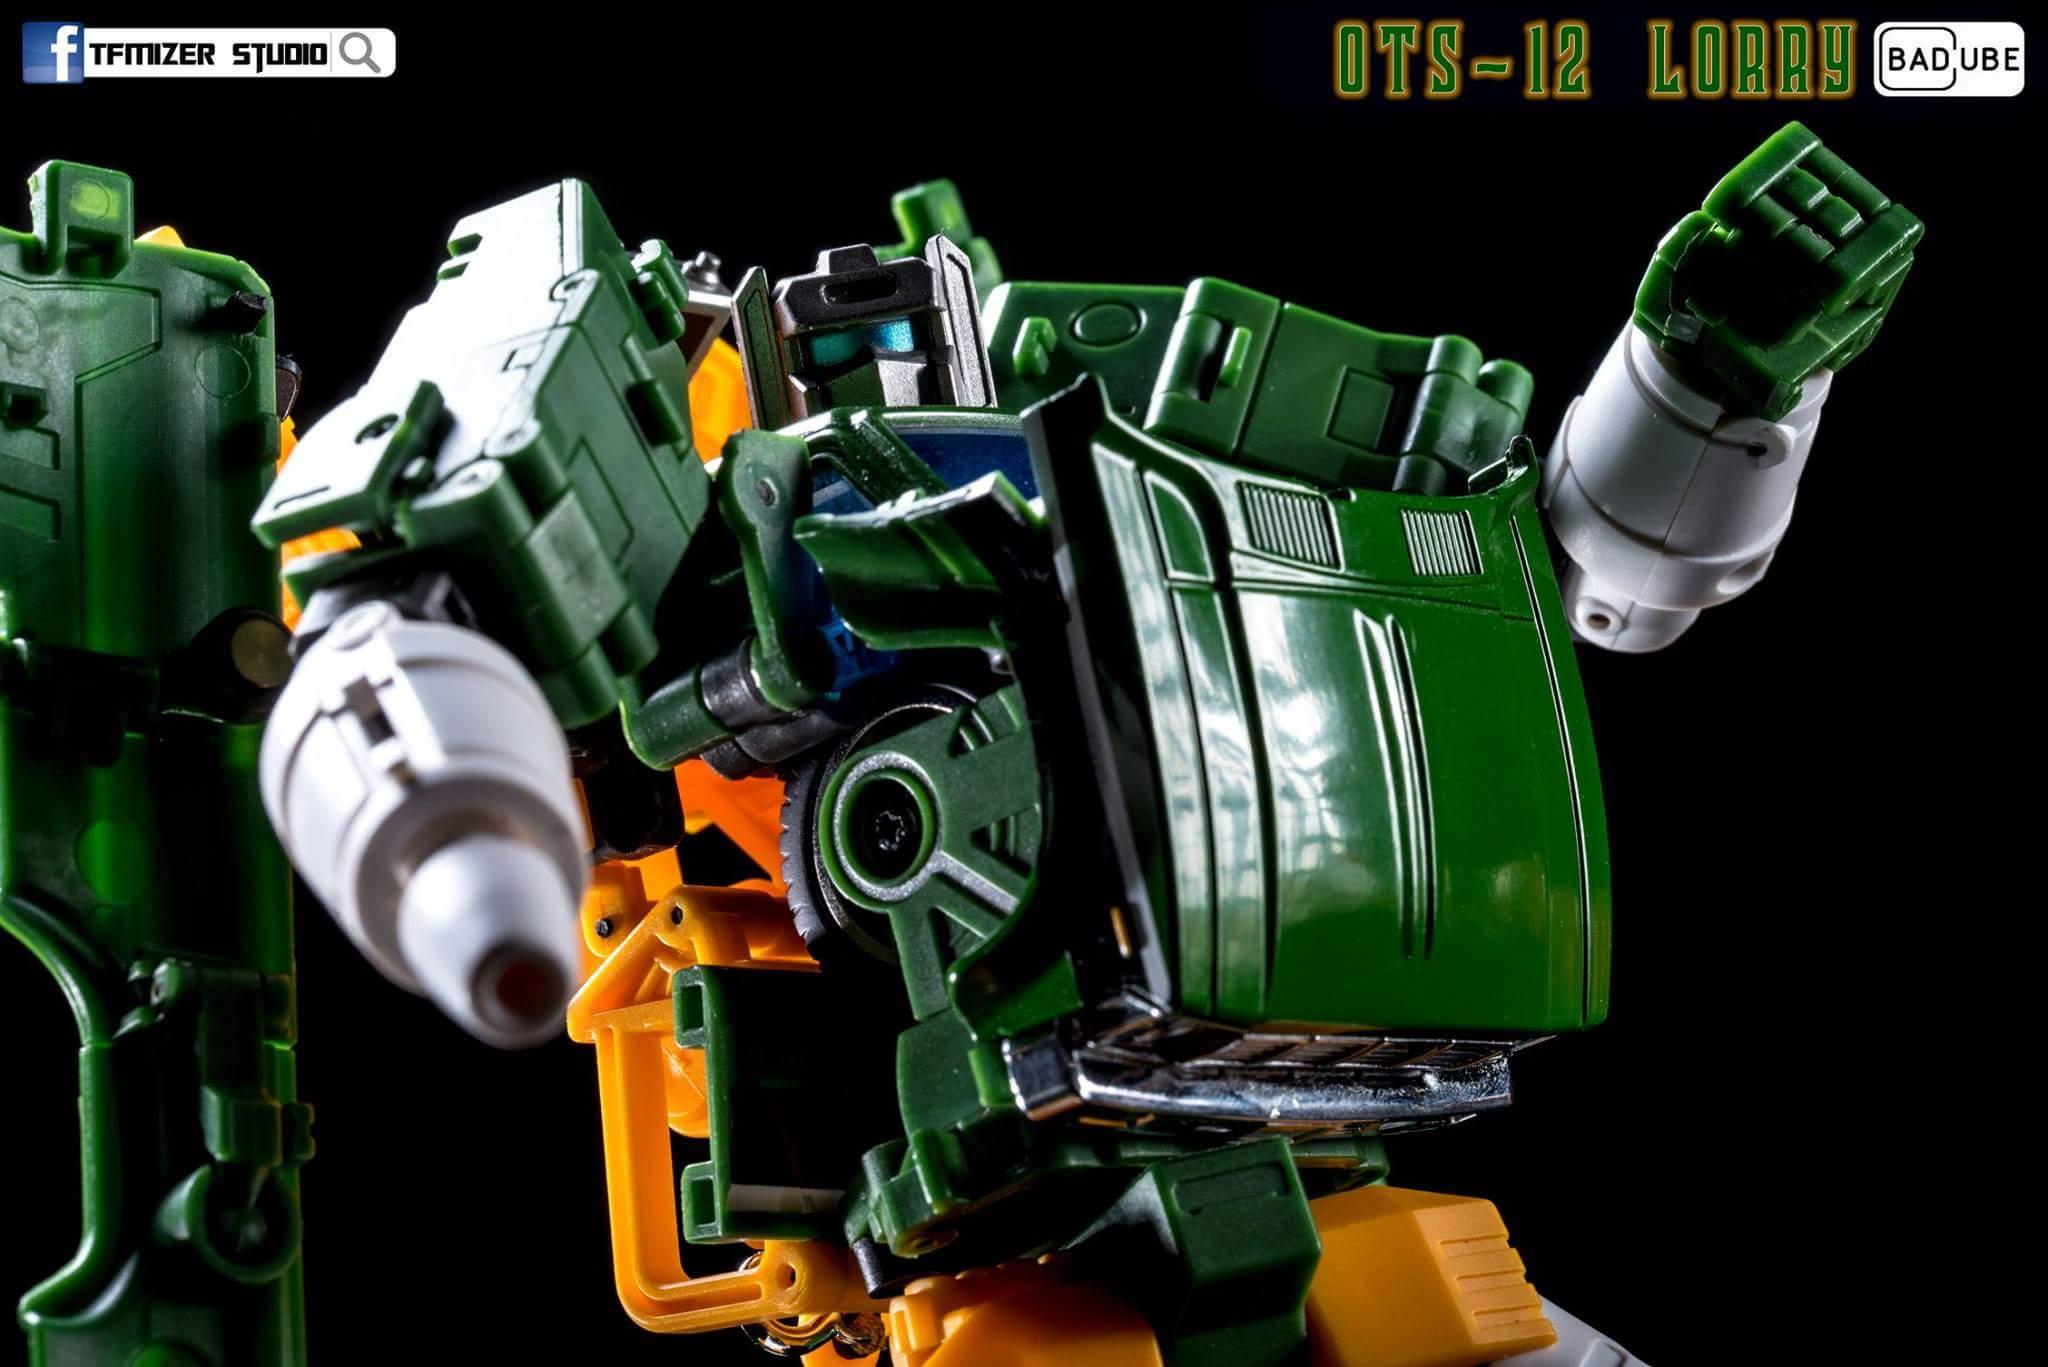 [BadCube] Produit Tiers - Jouet OTS-12 Lorry - aka Hoist/Treuil SD4Ie4Ya